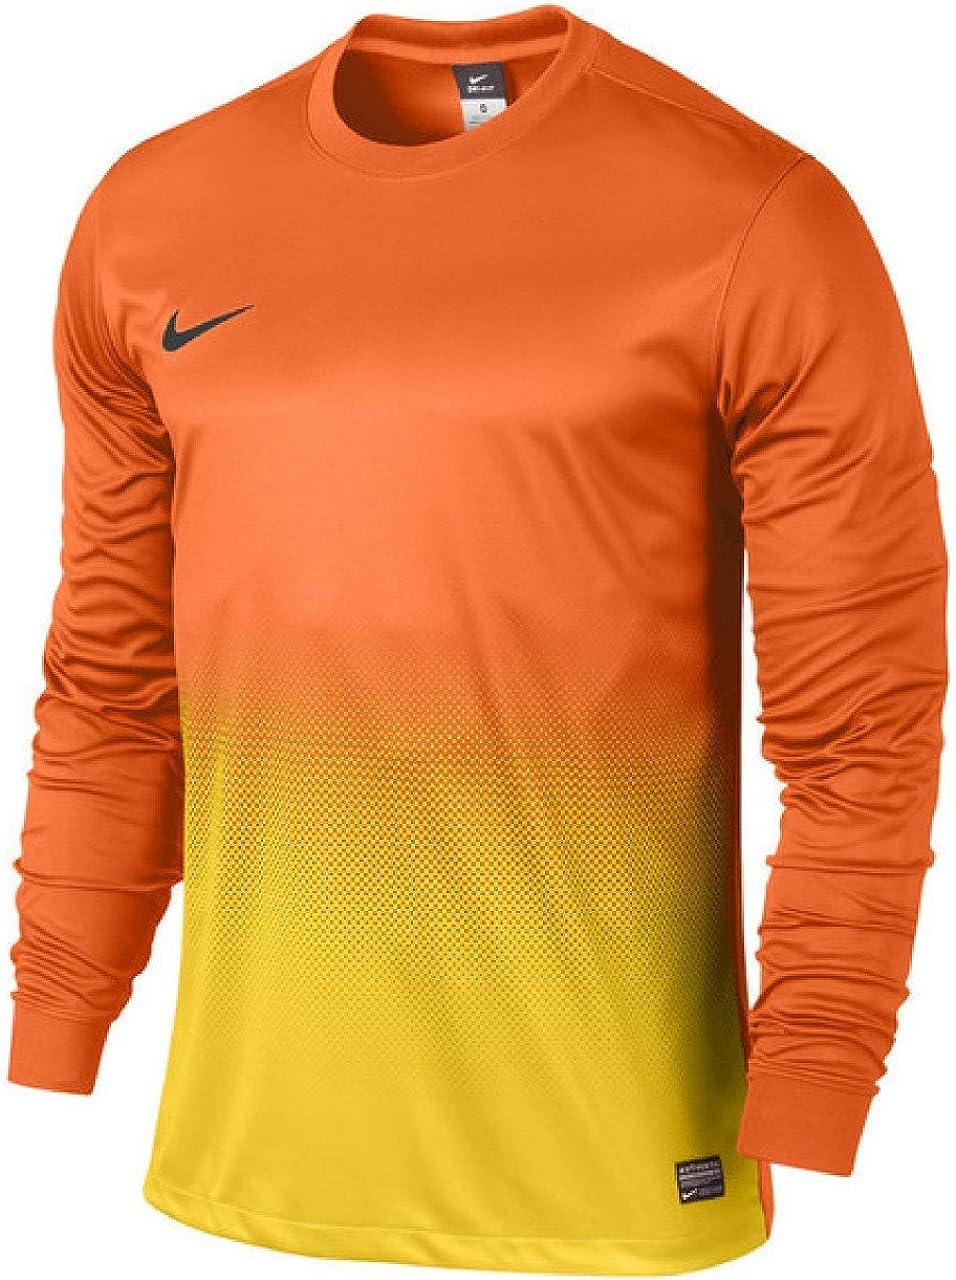 Nike Precision II GD Camiseta Deportiva de Manga Larga